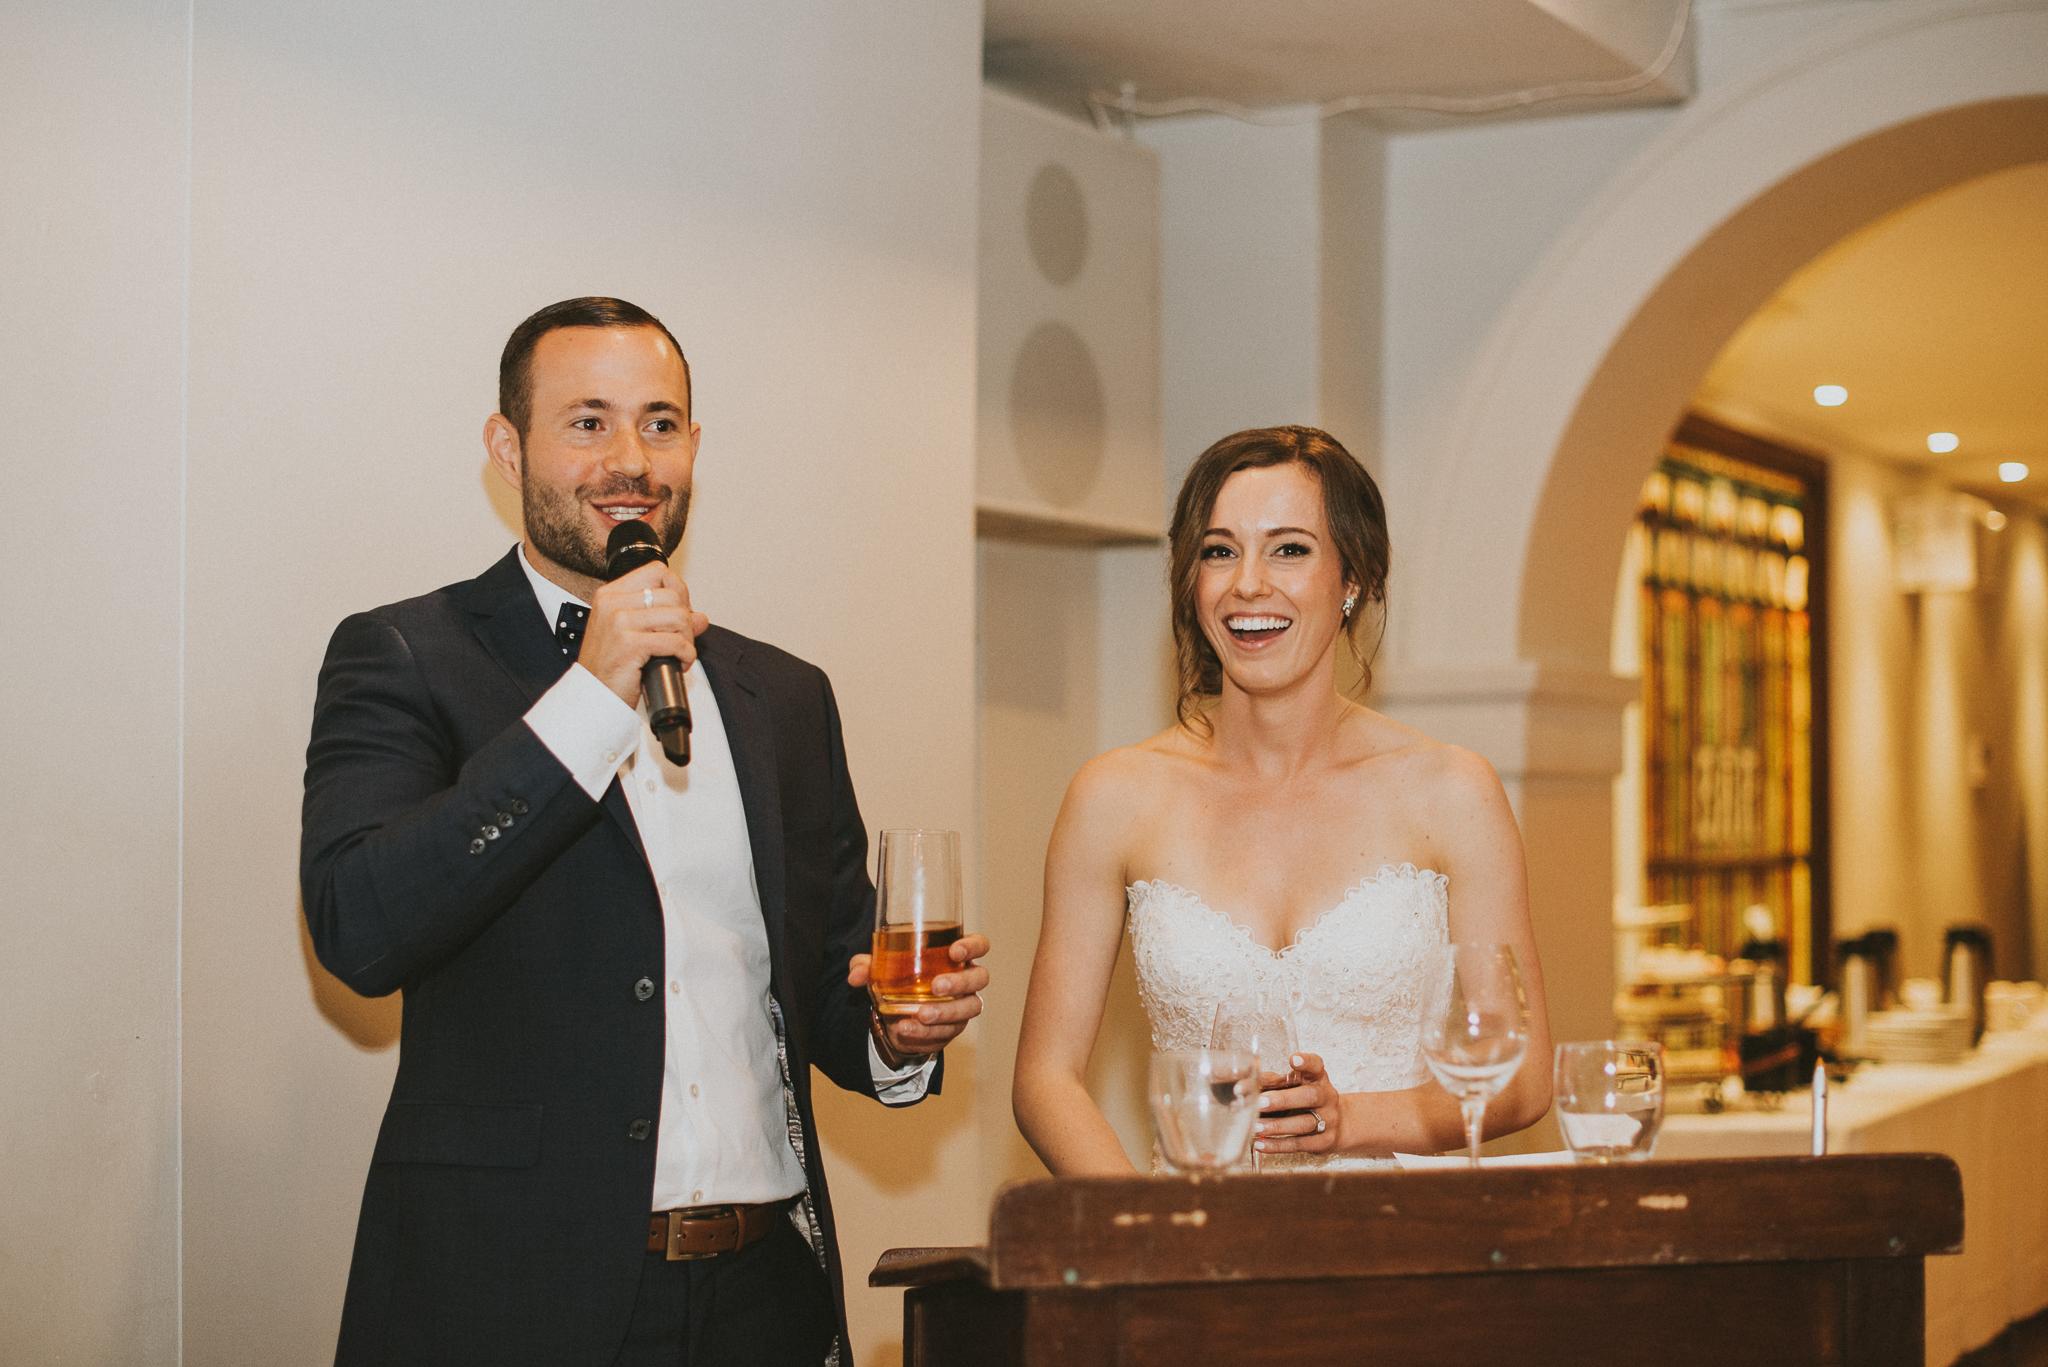 229-permanent-vancouver-wedding-courtneysteven-web-9438.jpg